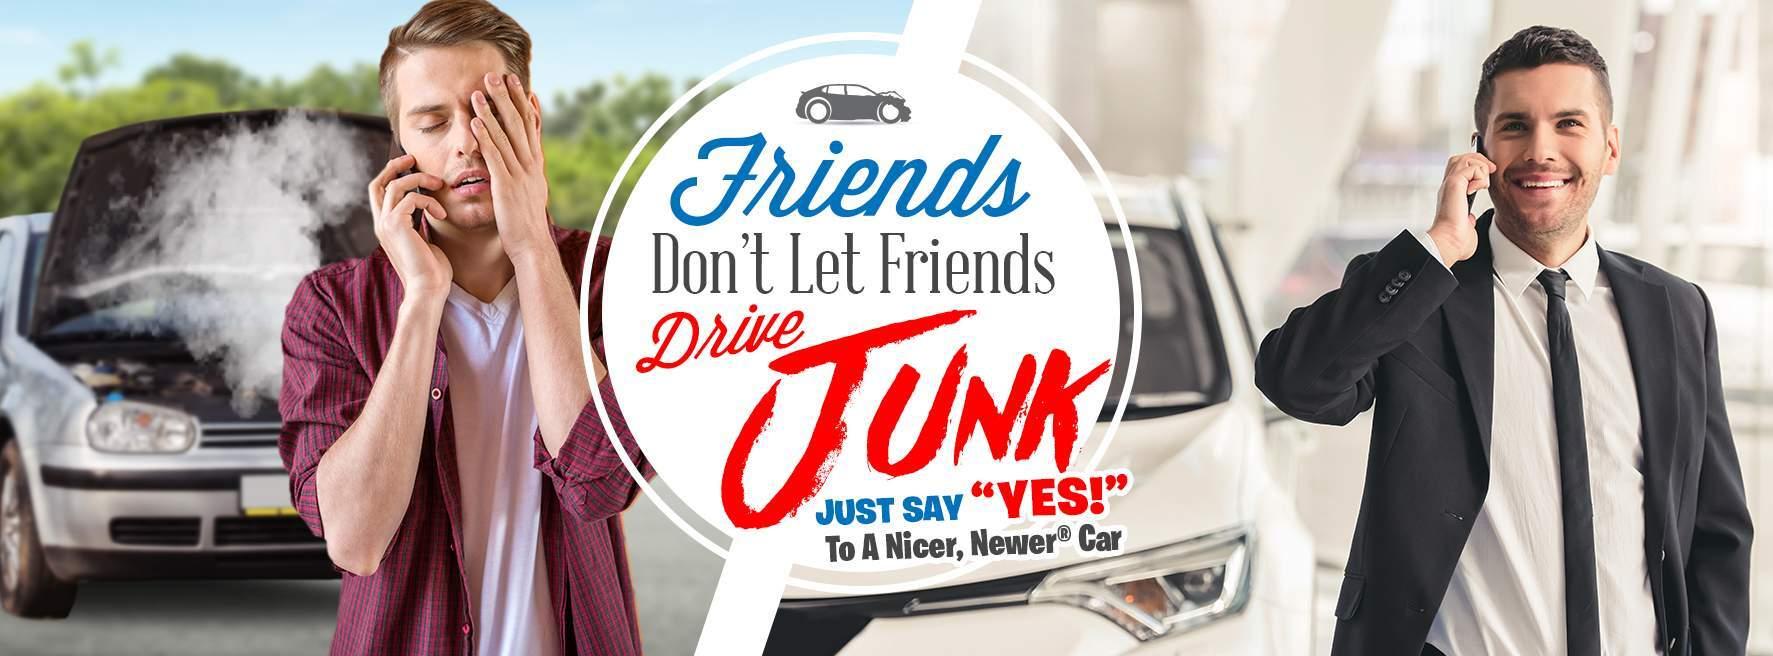 Car Dealerships Spokane Wa >> Used Car Dealership Spokane Valley WA | Used Cars Auto Credit Sales